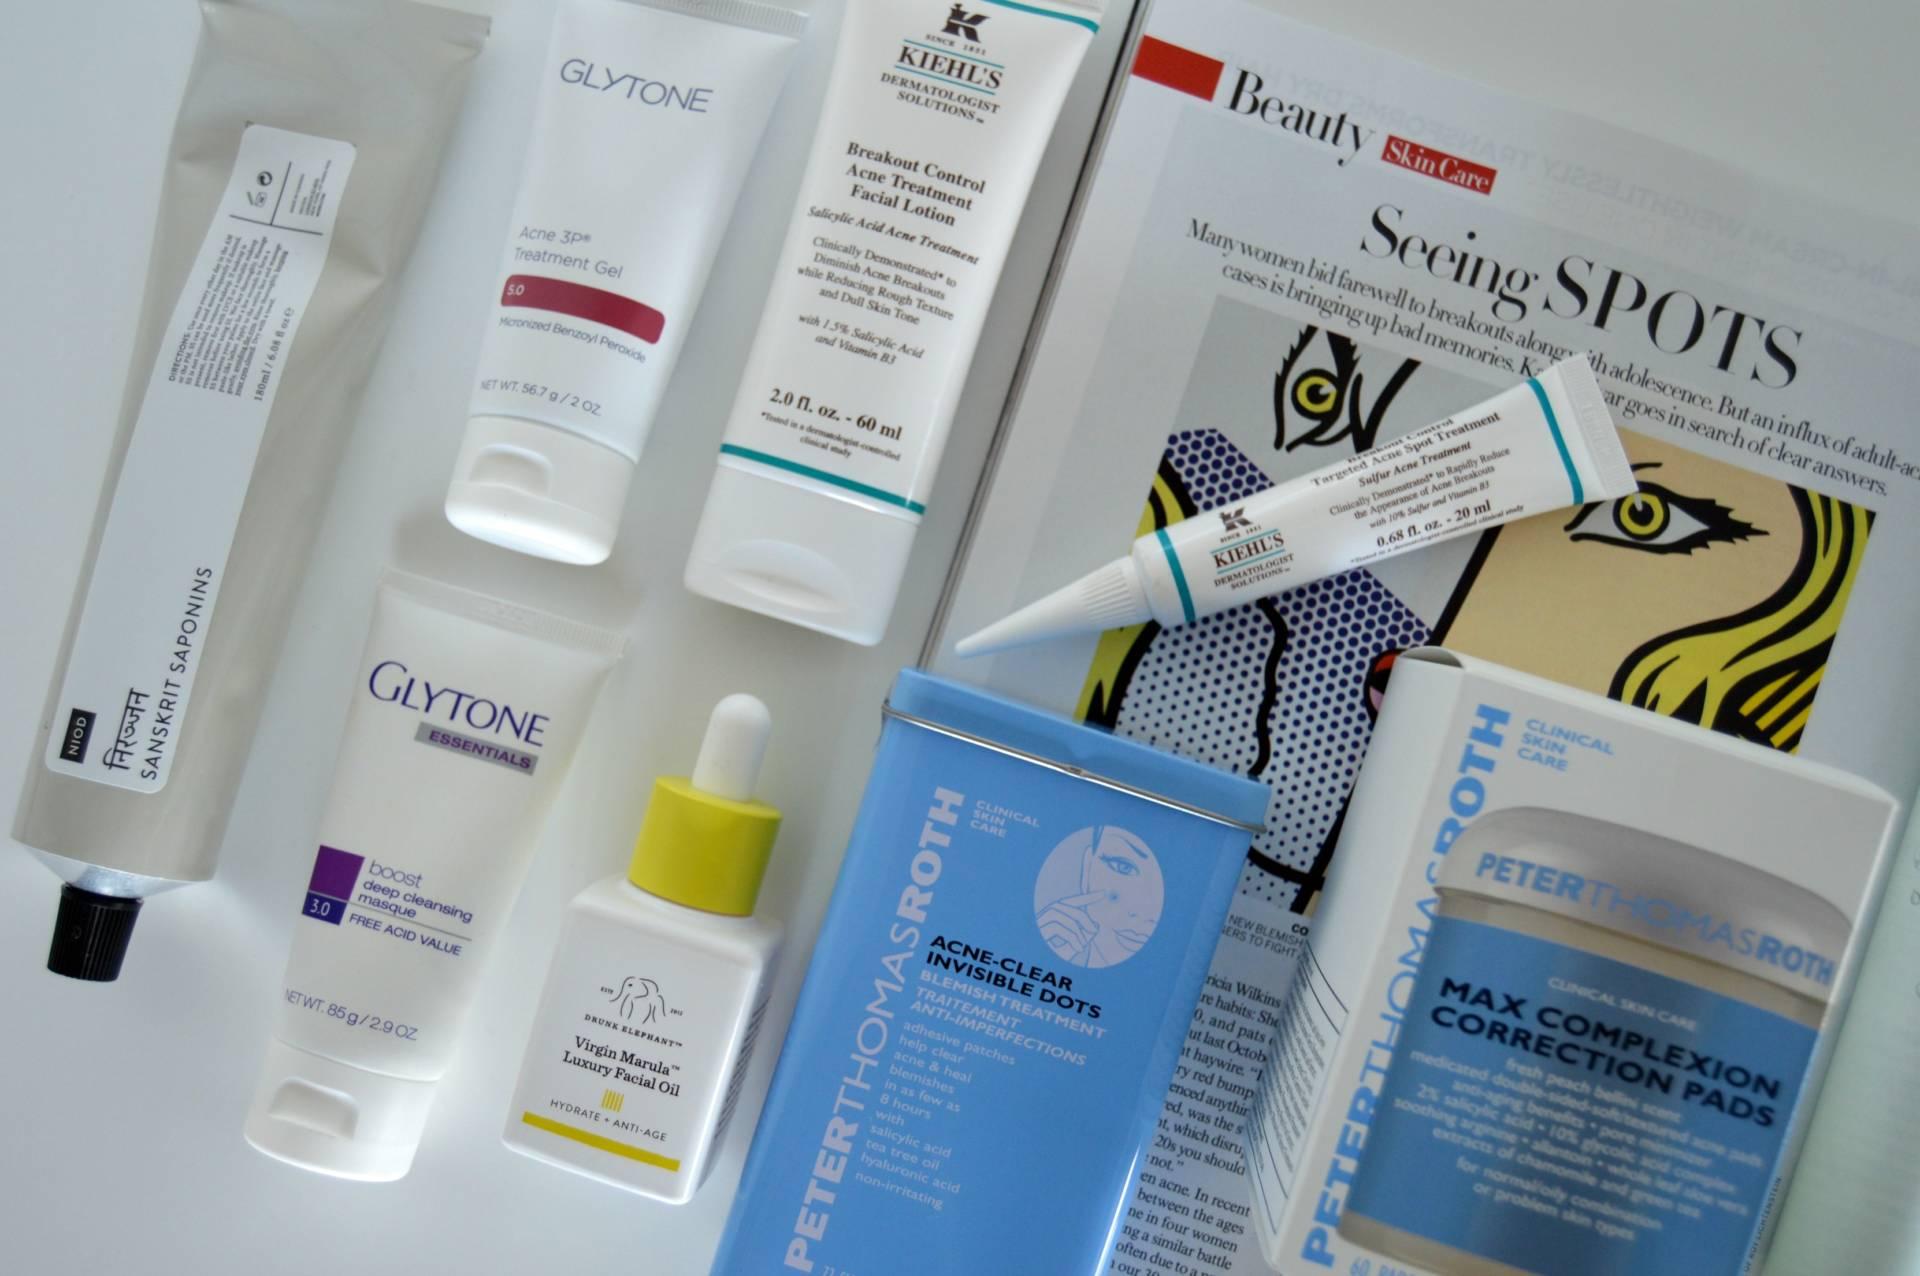 acne-fighting-solutions-inhautepursuit-review